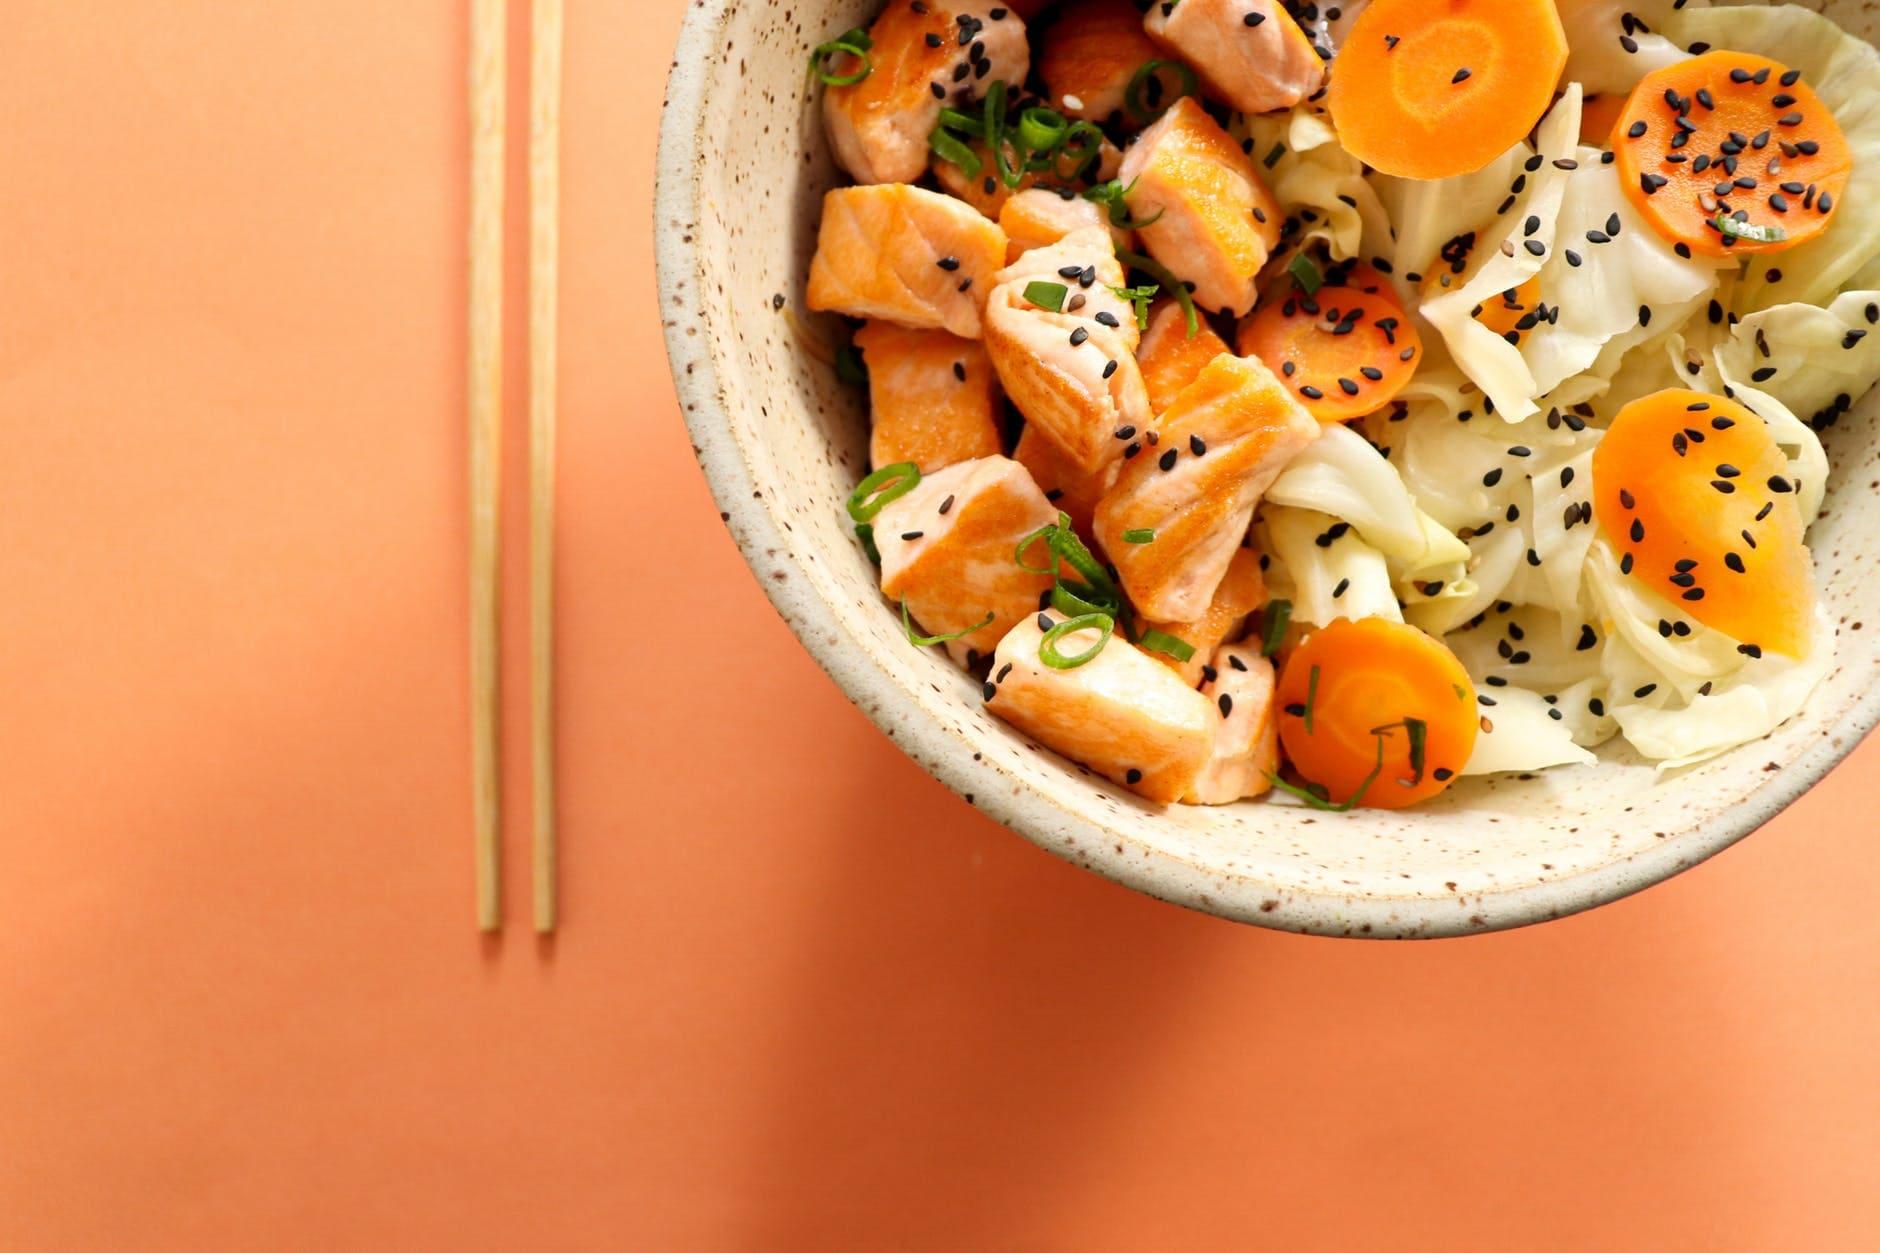 How to make arugula salad with orange